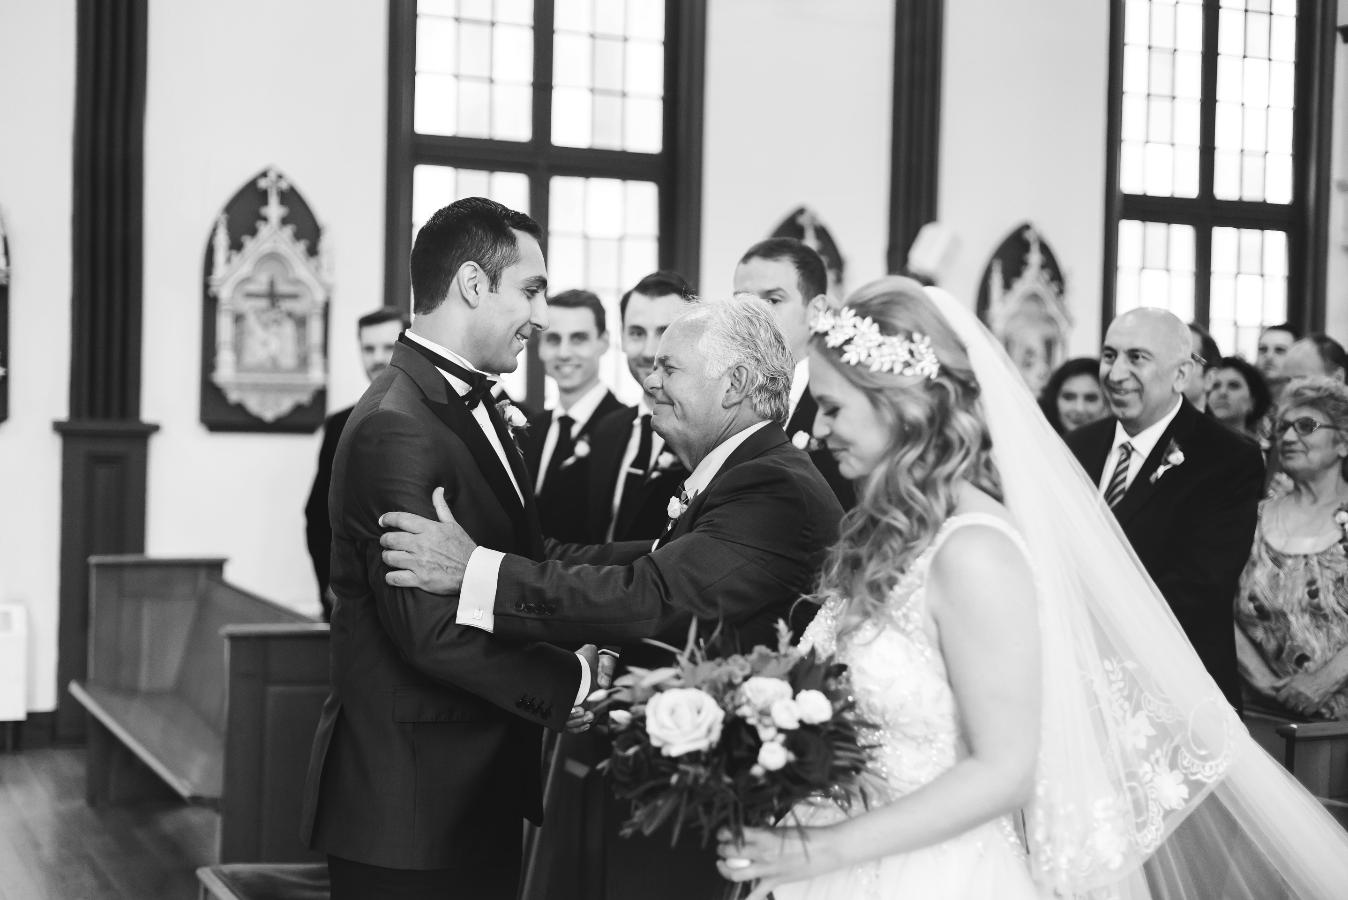 Moments-by-Lauren-Hamilton-Toronto-Niagara-Wedding-Photographer-Genuine-Emotional-Images-Photo-6.png